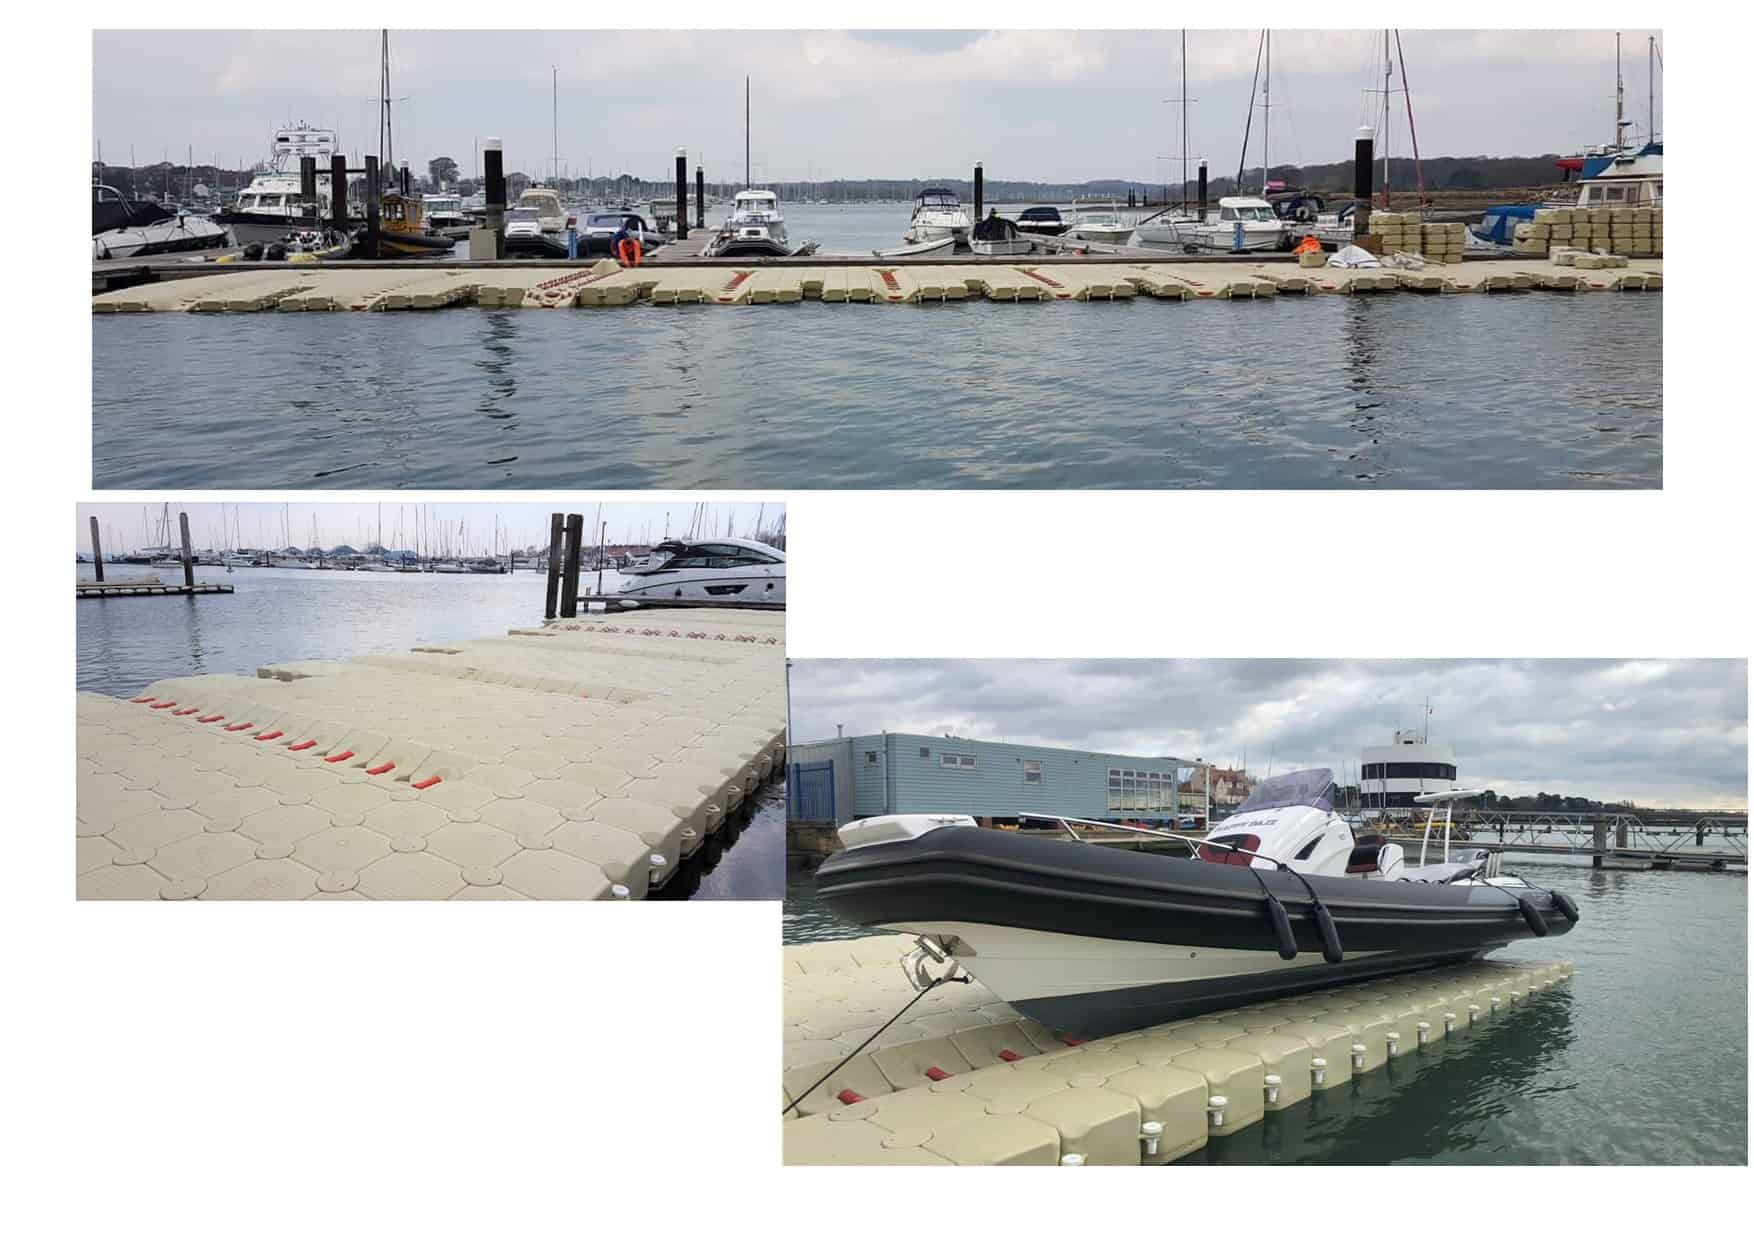 Marine Matters Drive on docks